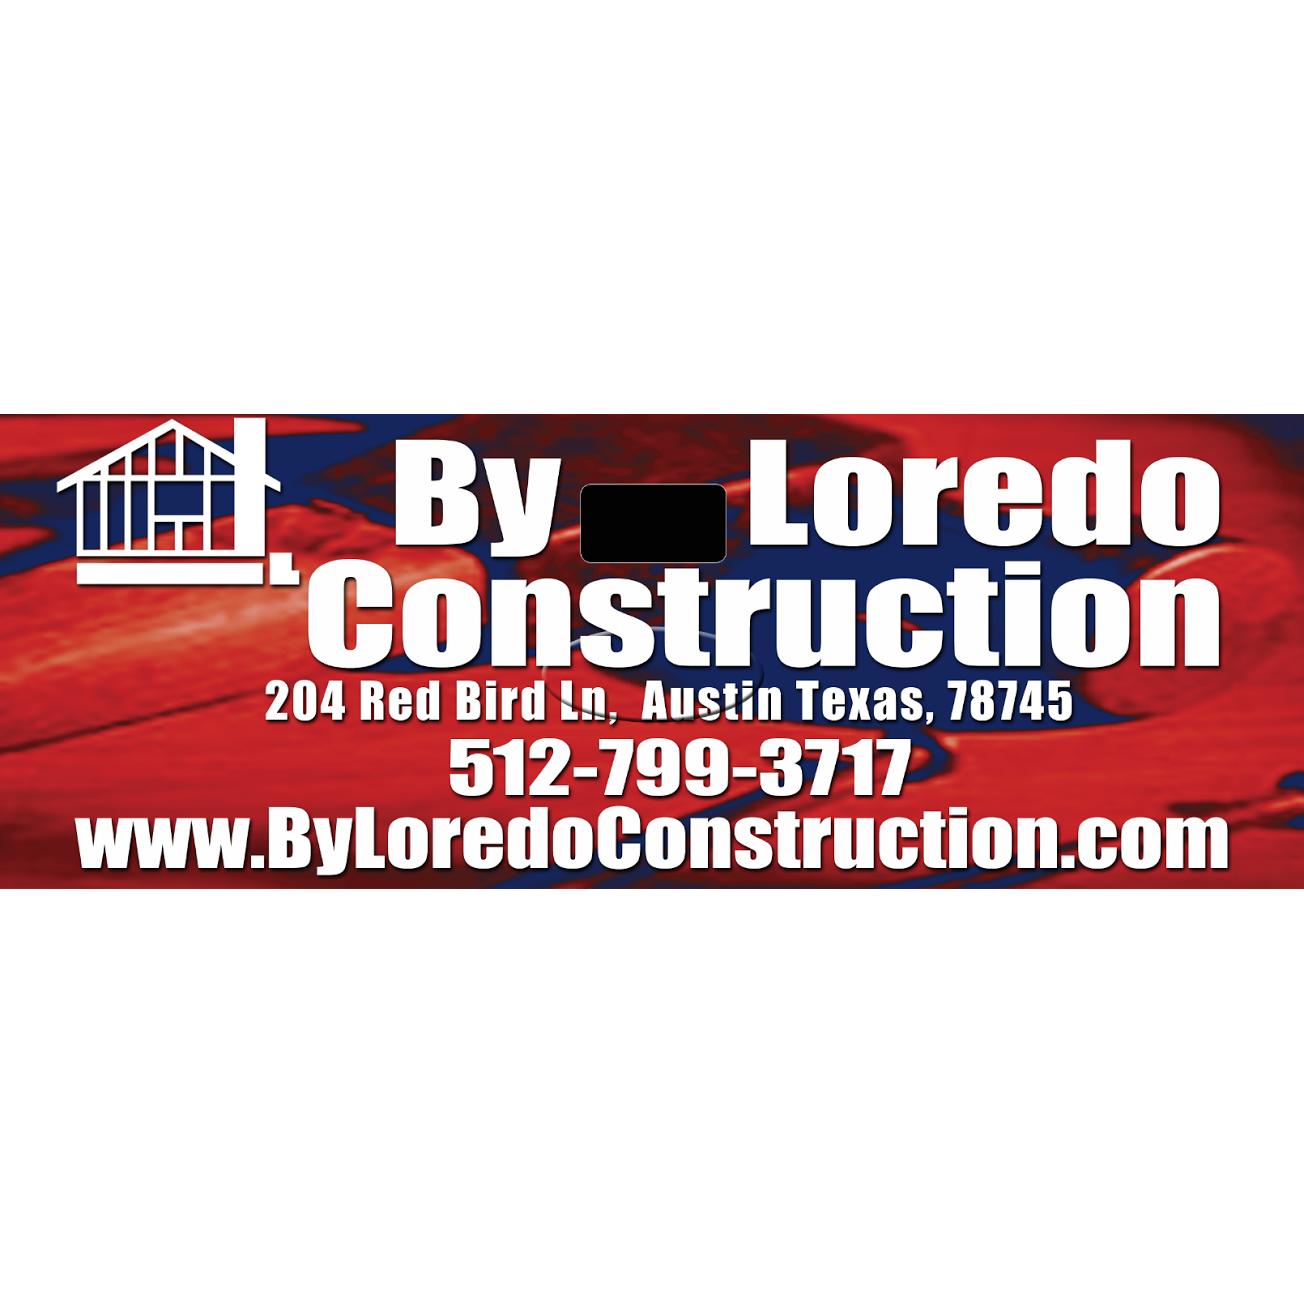 By Loredo Construction